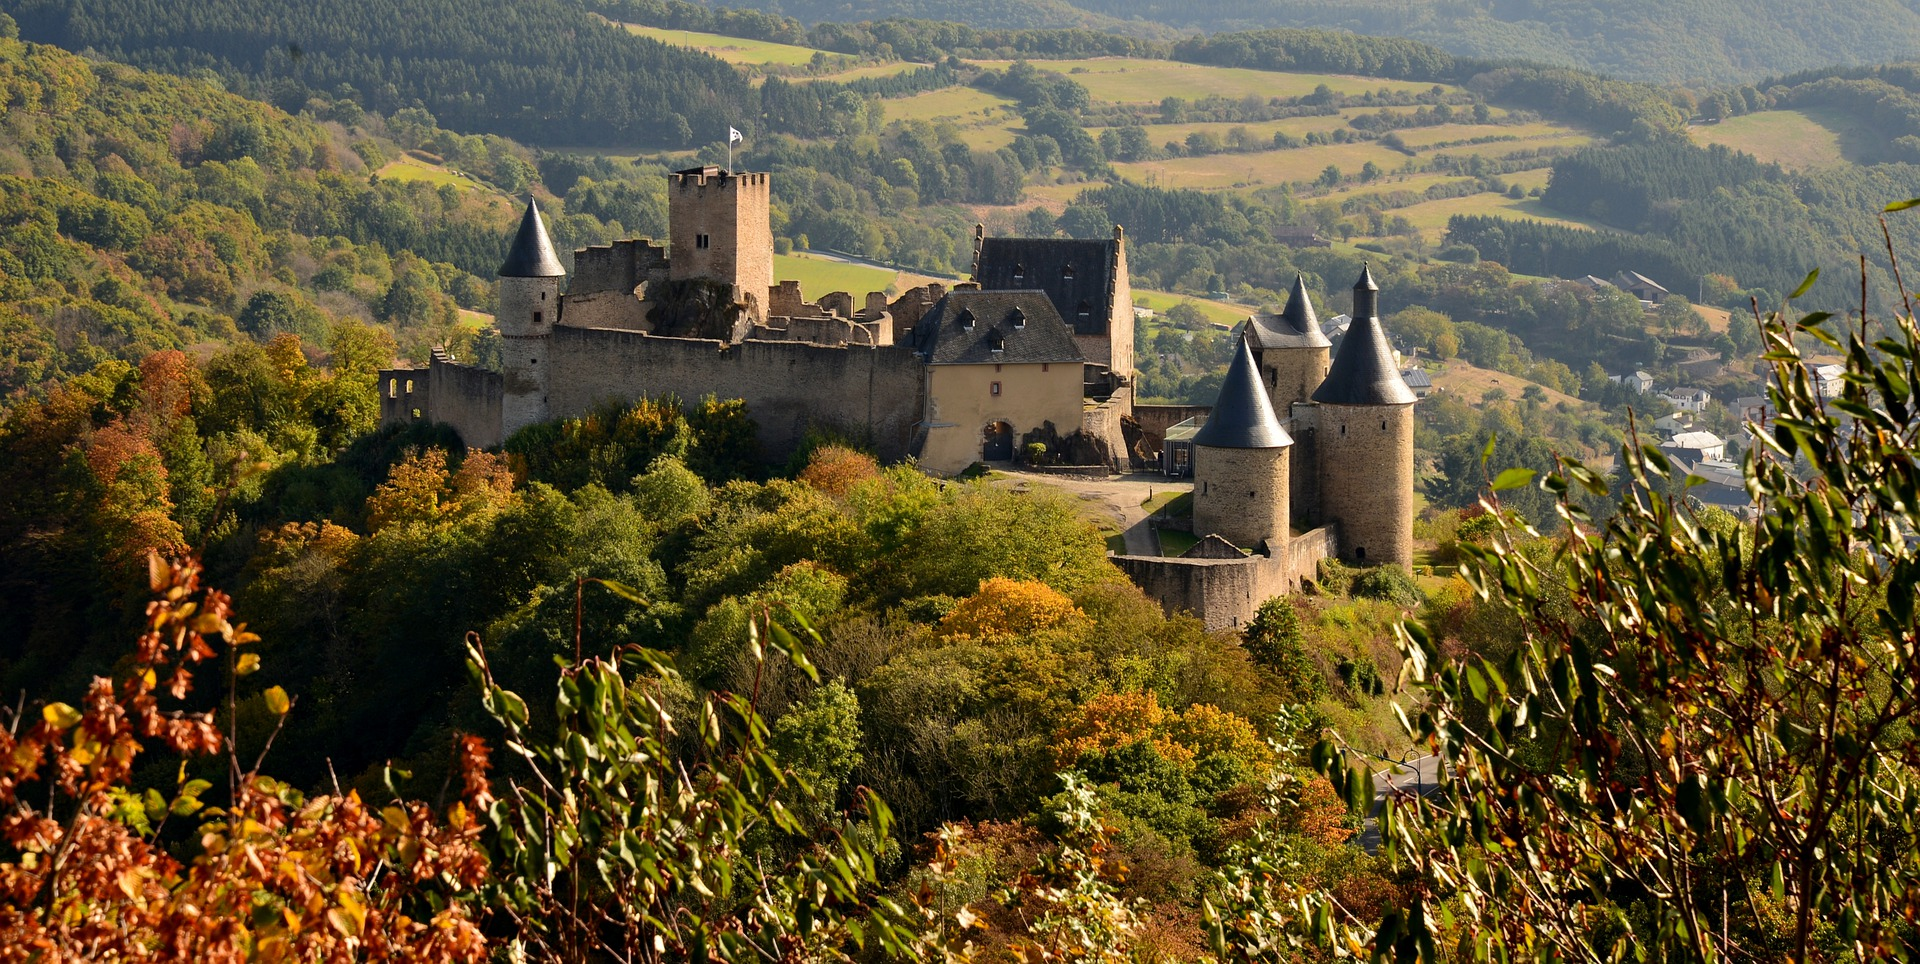 castle-bourscheid-4363982_1920.jpg